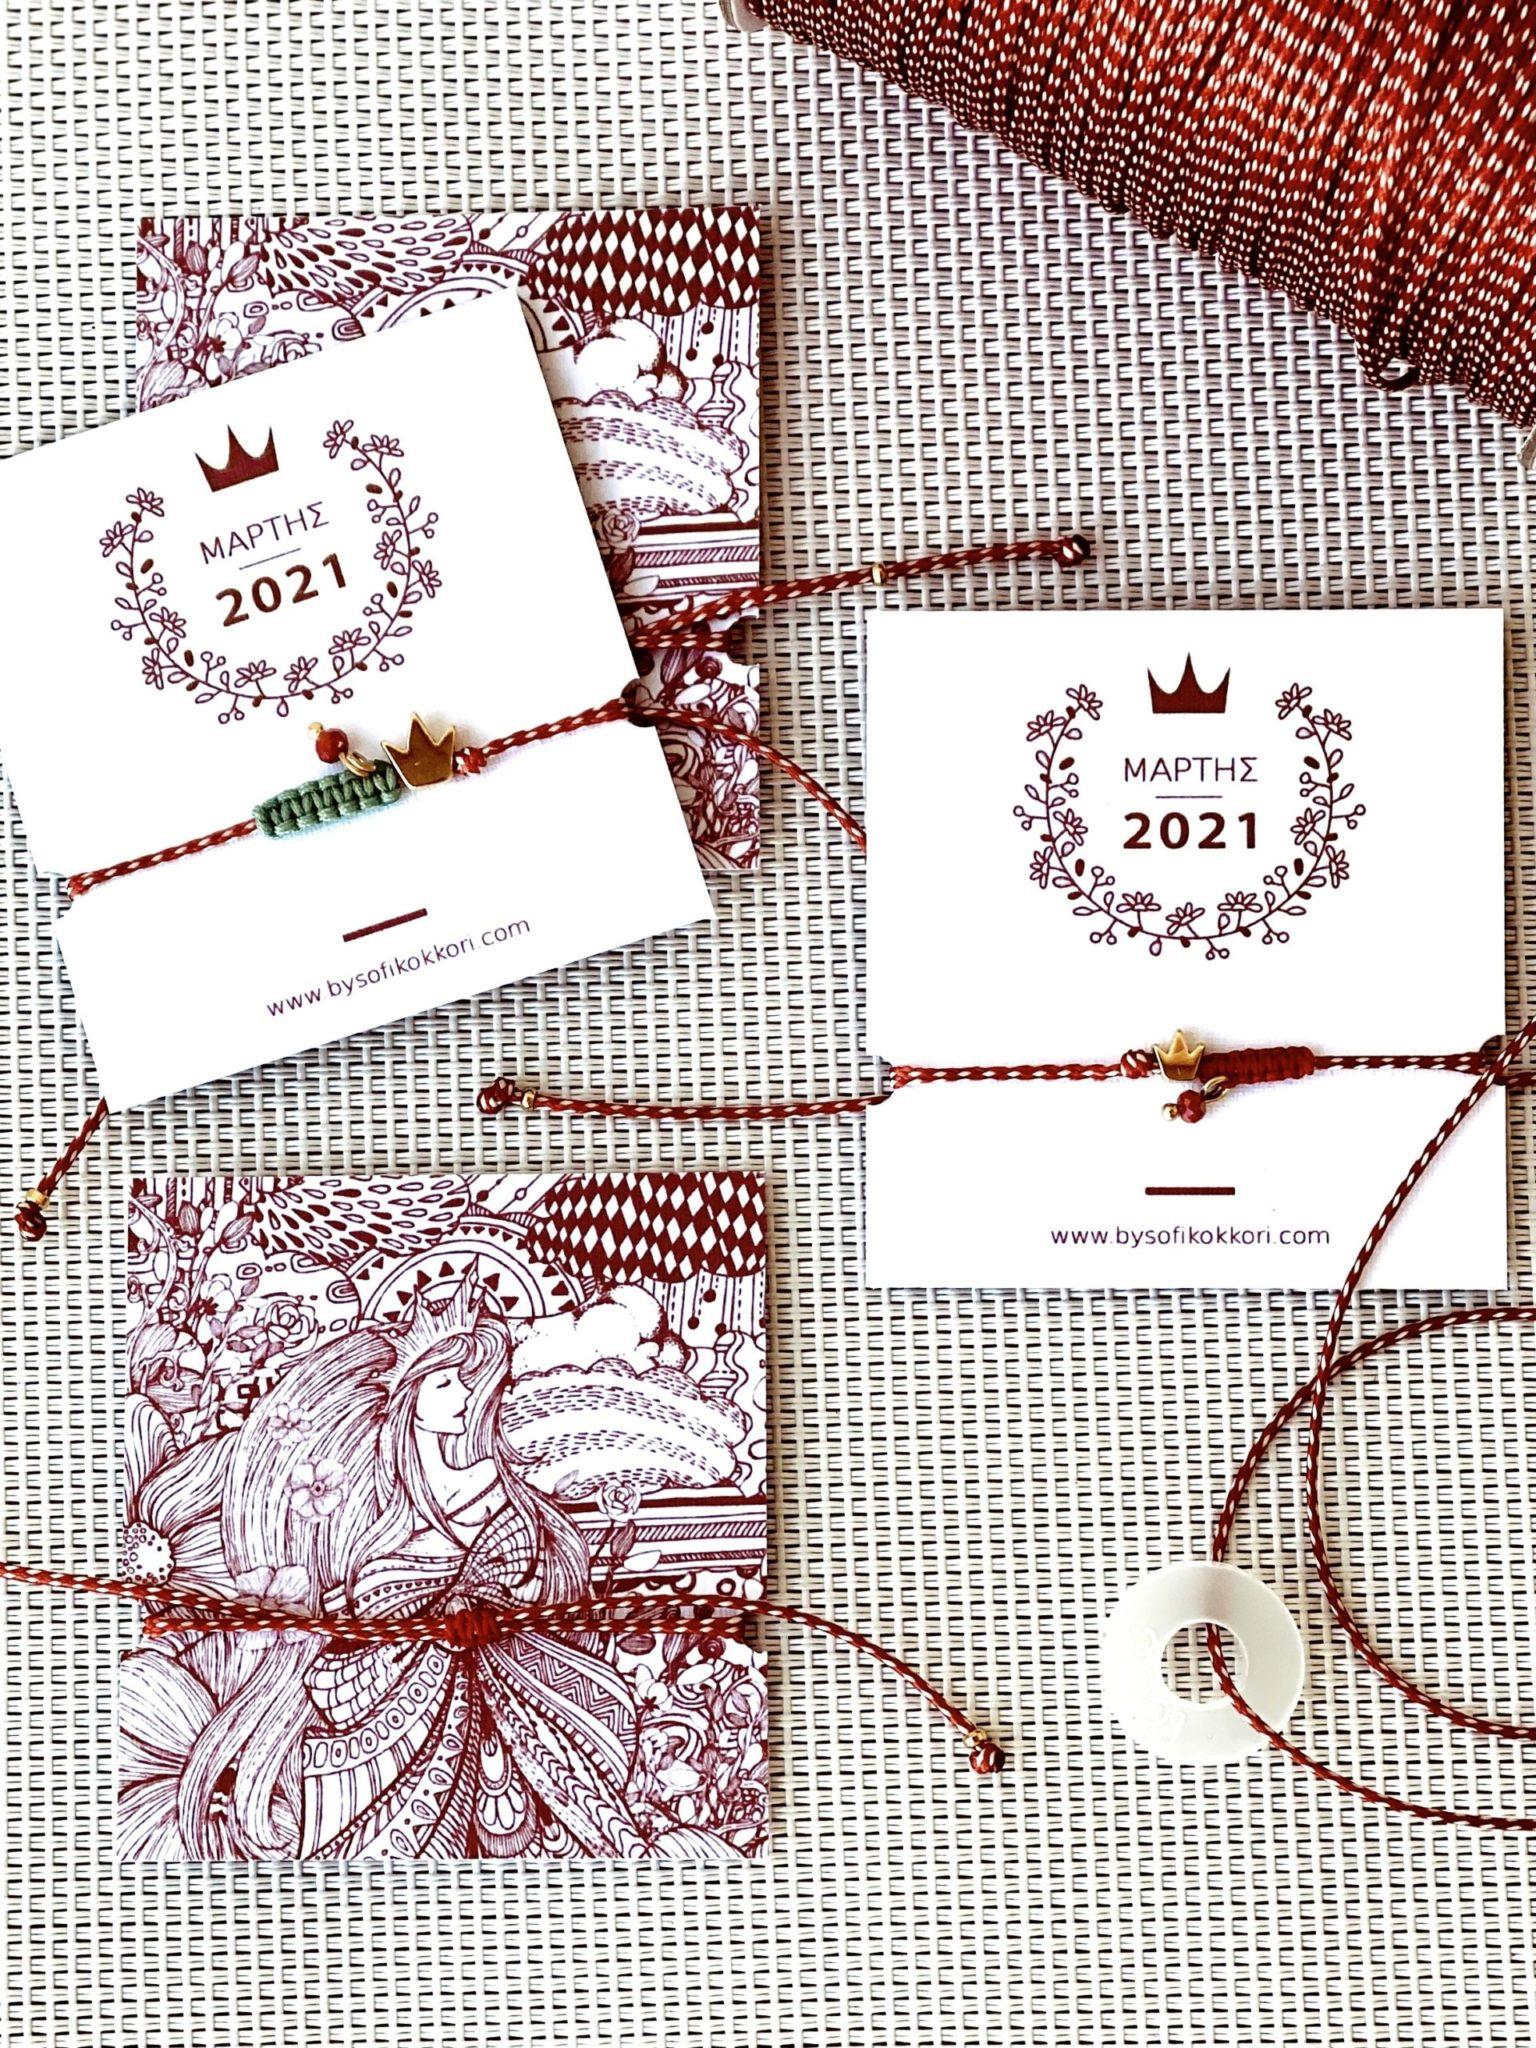 Martis-2021-crown-bracelets-macrame-empros-pisw